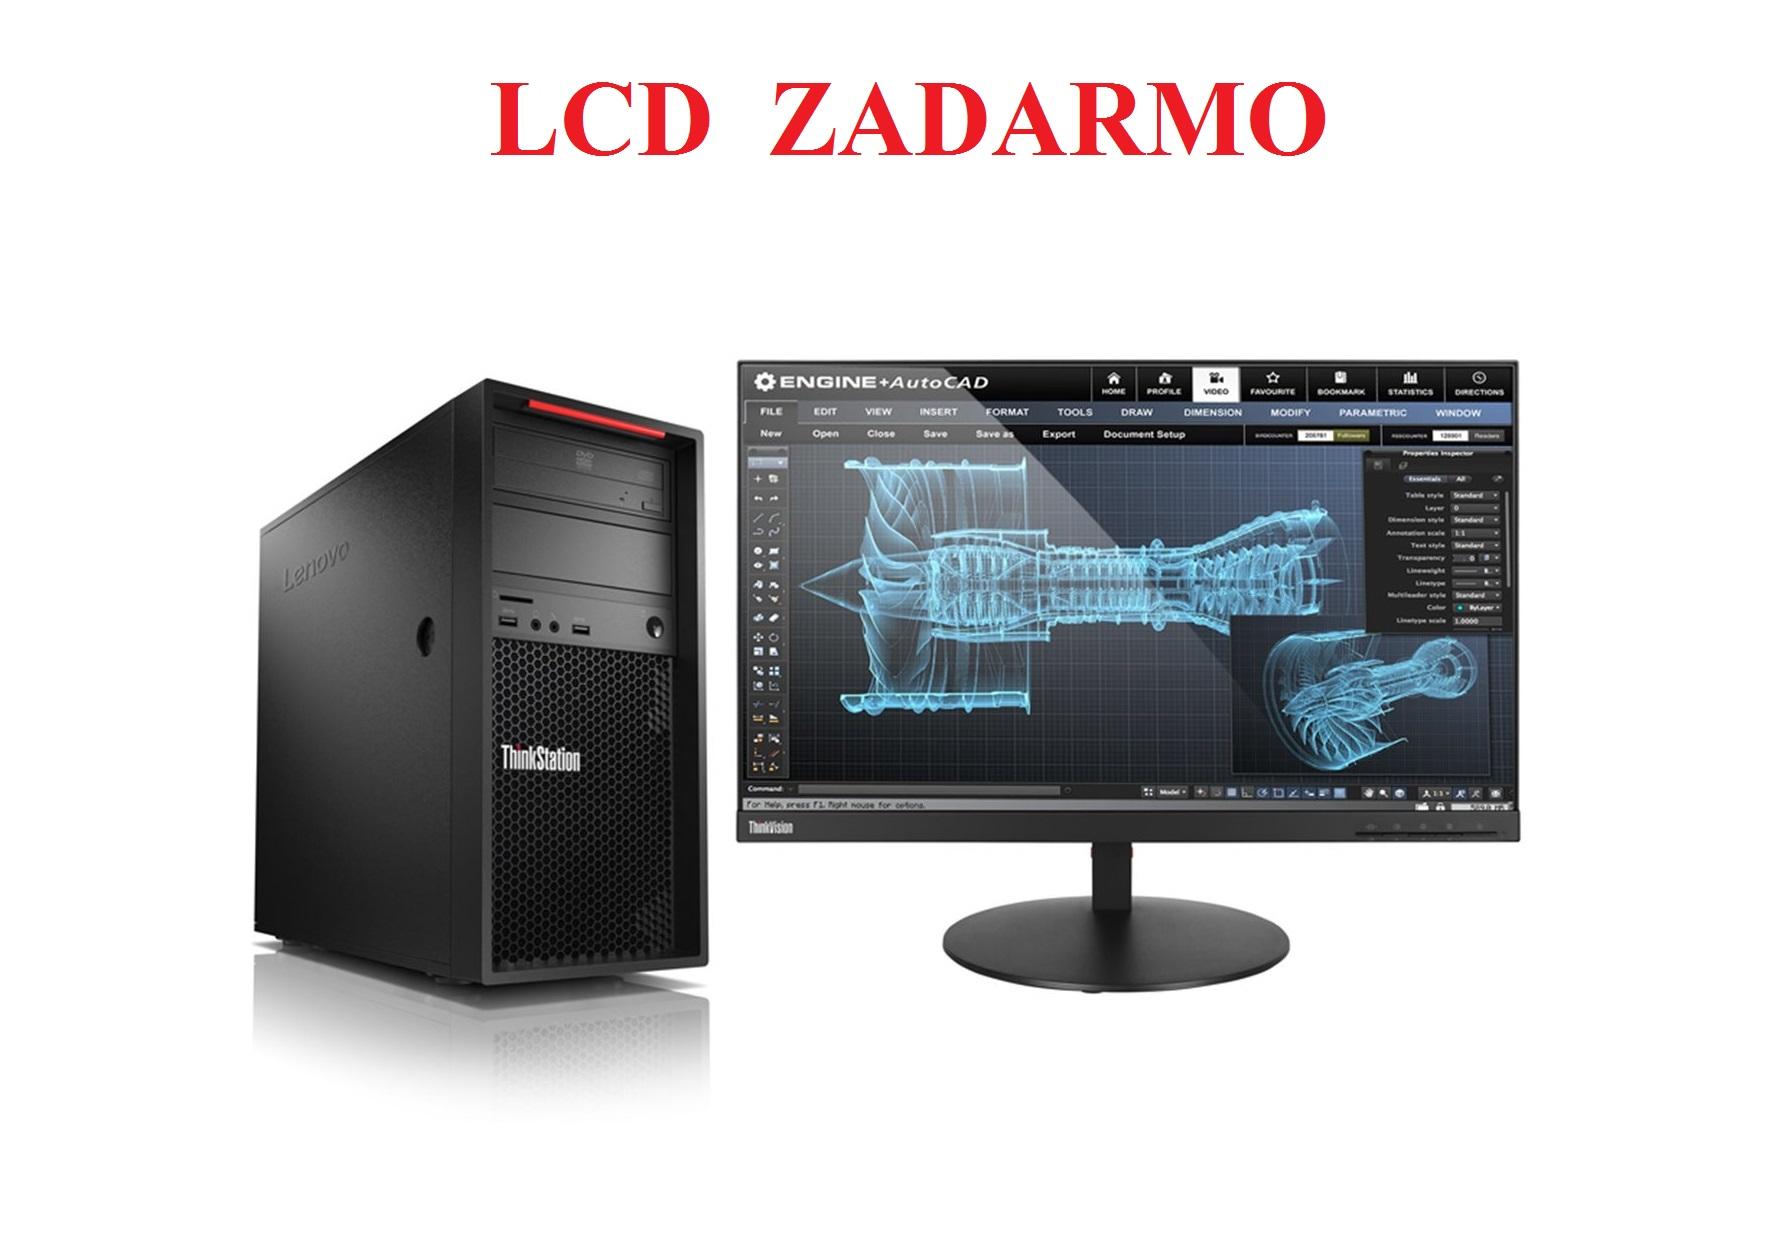 TS P520c TWR/W-2123/16GB/256SSD/DVD/W10P+LCD ZADARMO